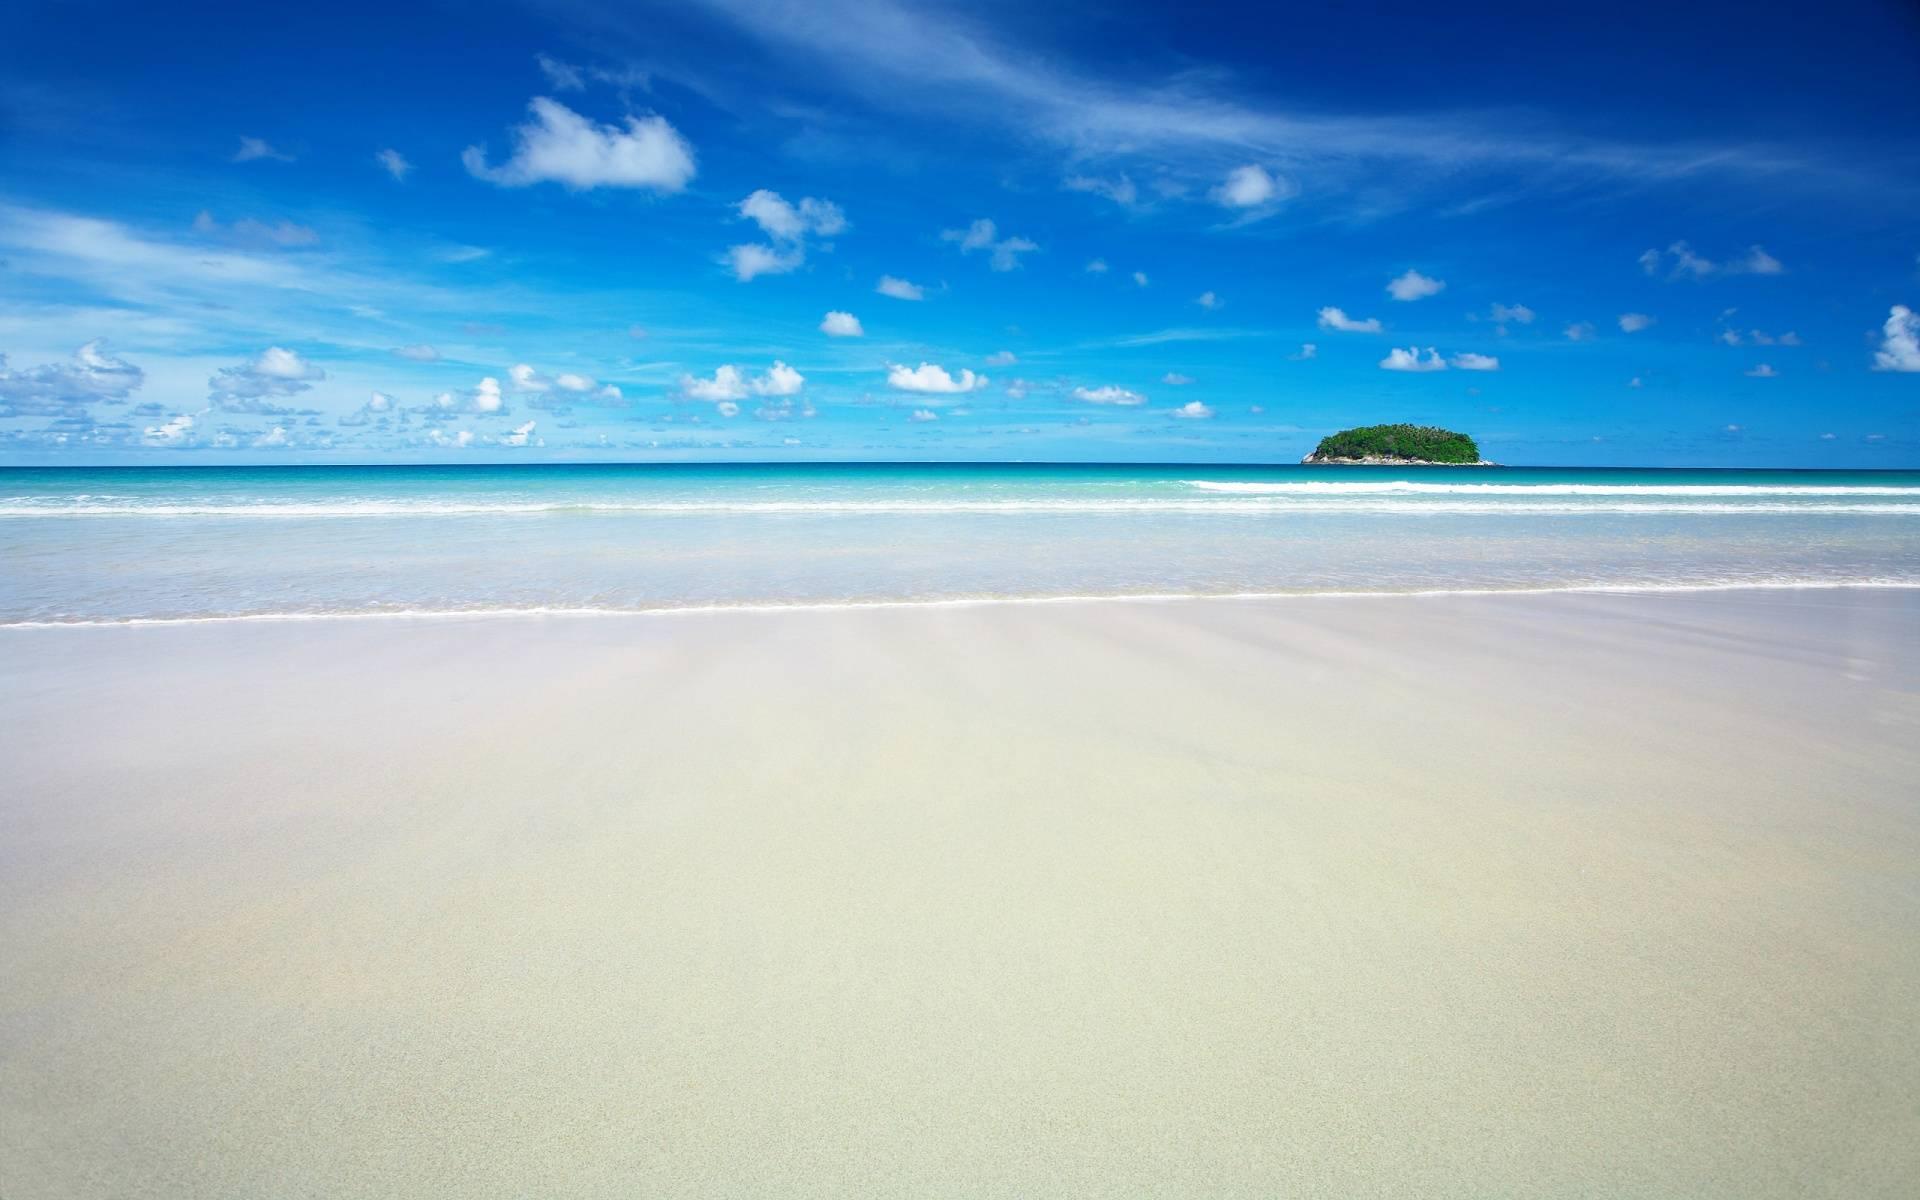 Desktop Spring Theme Beach Ocean Themes Download desktop wallpapers 1920x1200